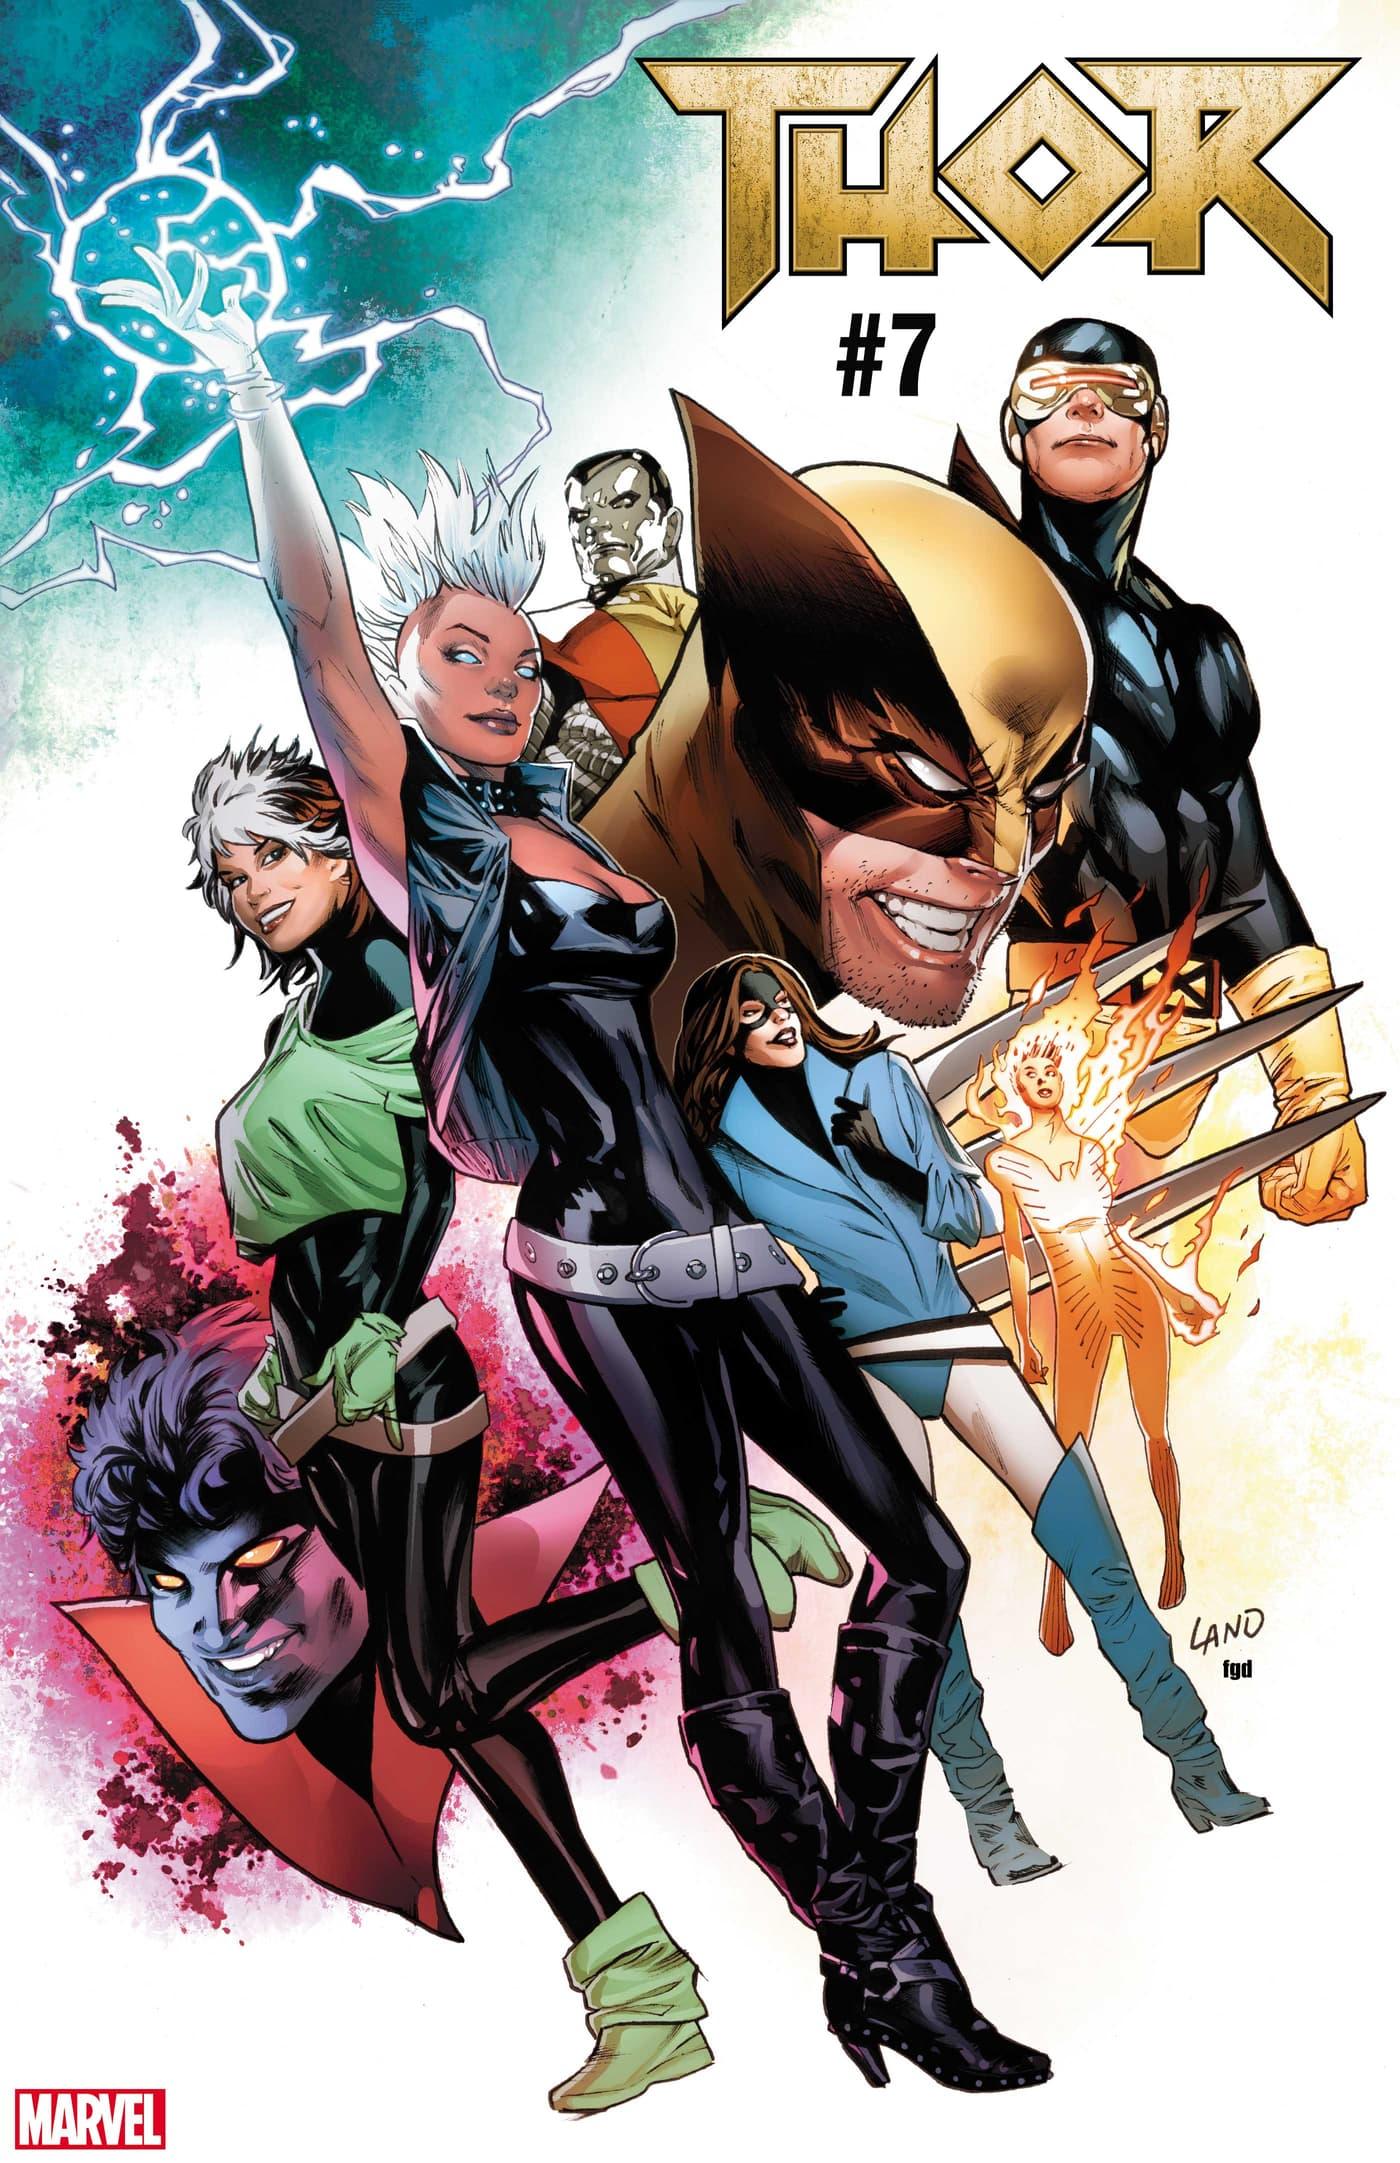 THOR #7 / UNCANNY X-MEN VARIANT COVER by Greg Land